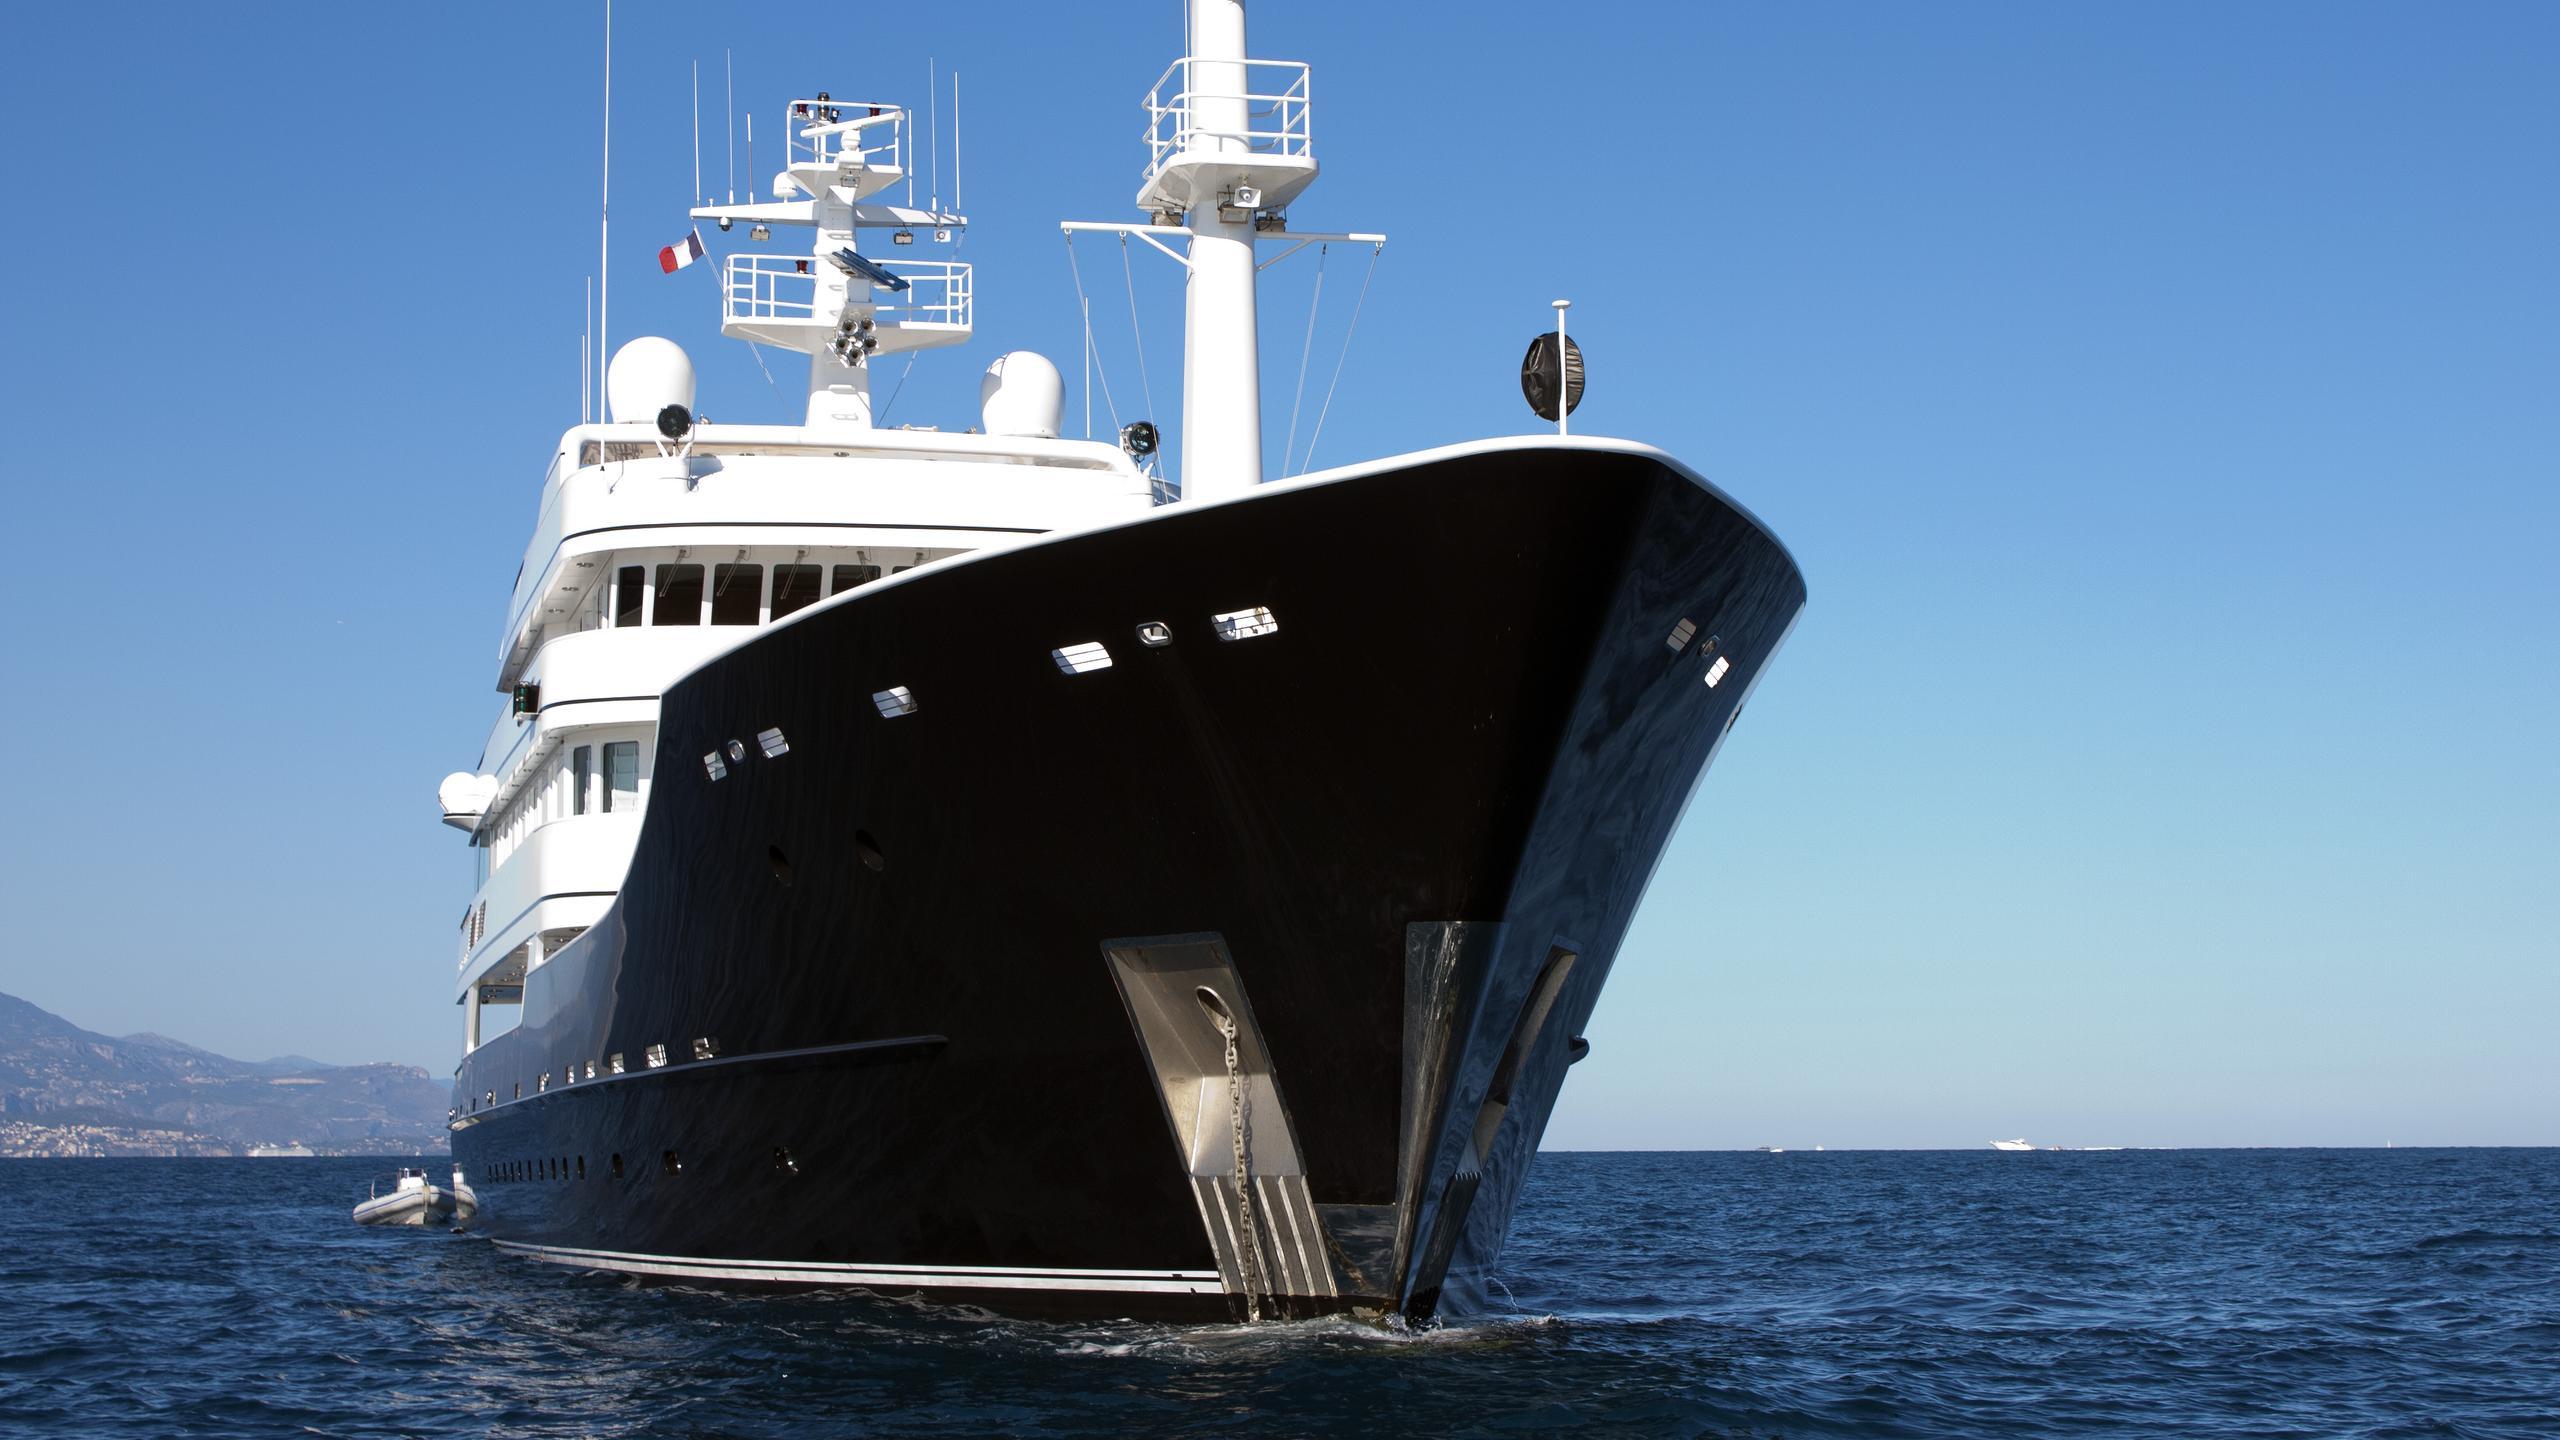 grand-rusalina-explorer-yacht-trinity-global-explorer-192-2003-59m-bow